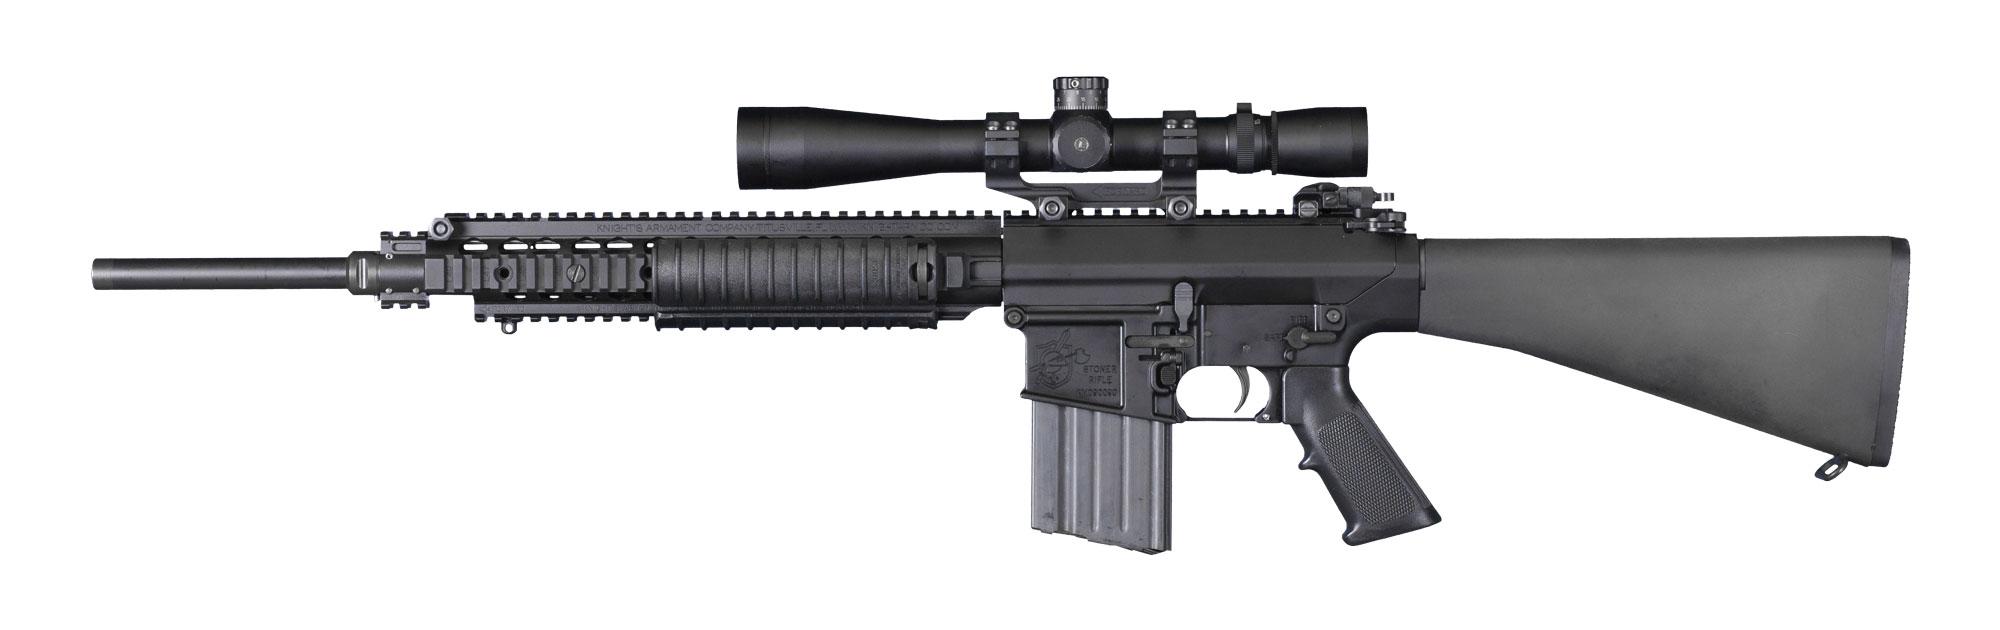 Rhs Feedback Exploded Gun Diagrams Http Wwwrarewinchesterscom Modelsshtml